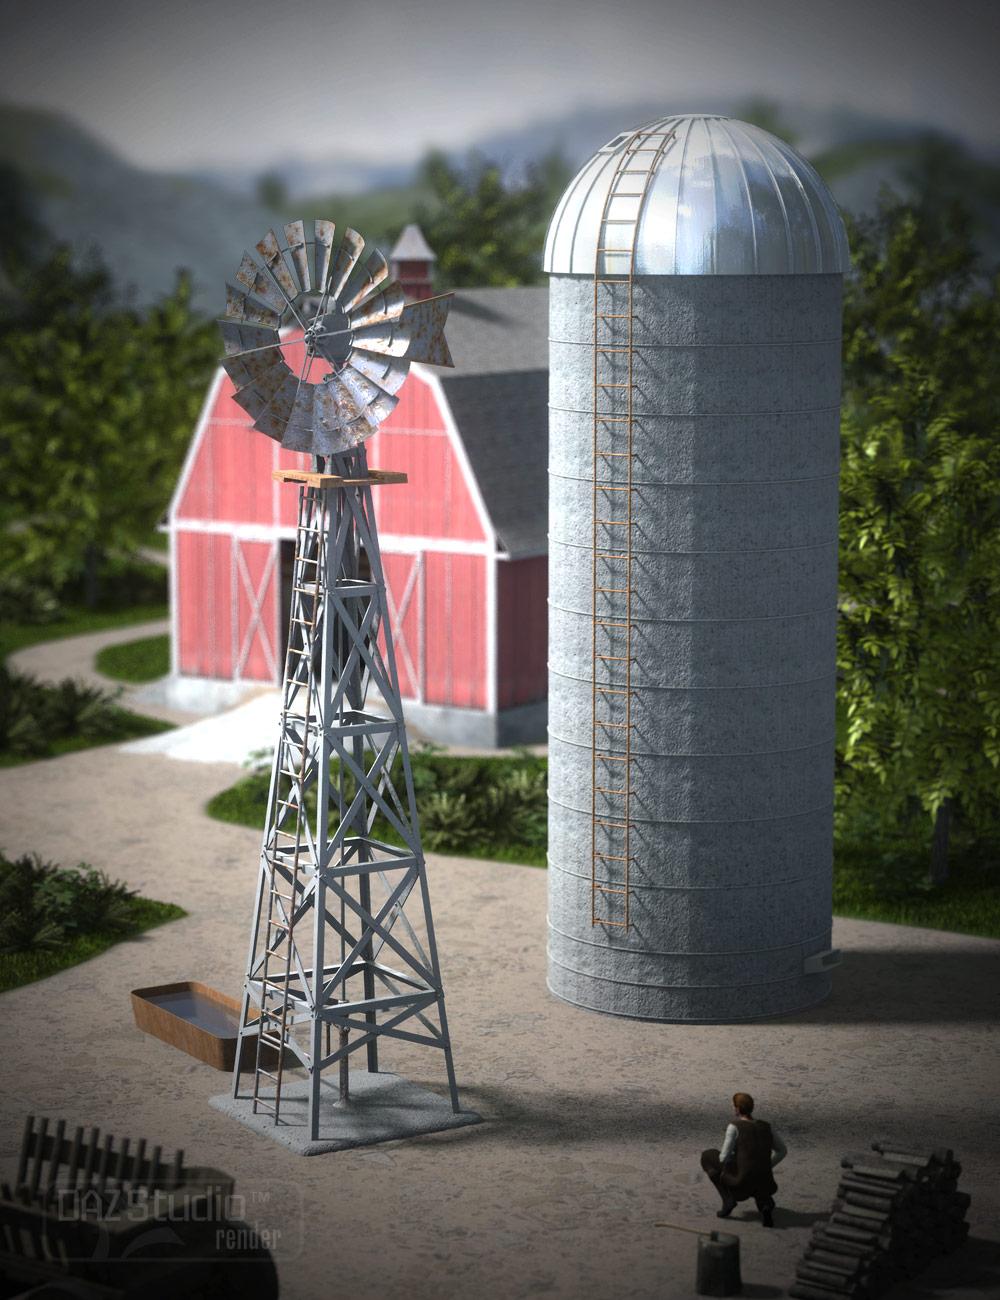 DAZ Water Pump and Grain Silo by: KRAIG, 3D Models by Daz 3D